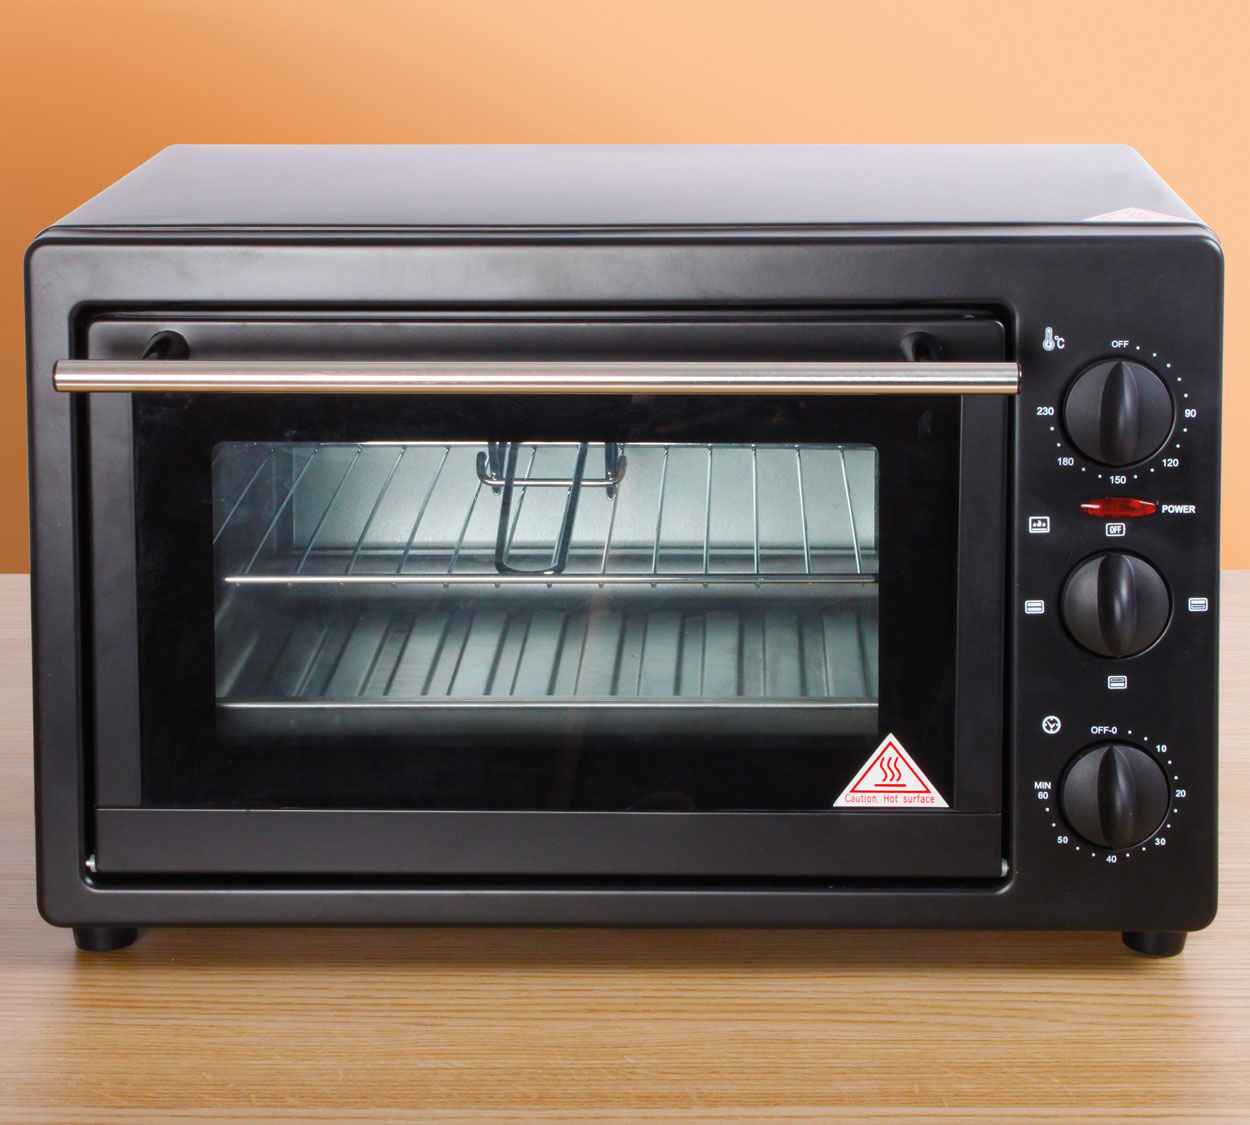 Image of Black 22 Litre Oven